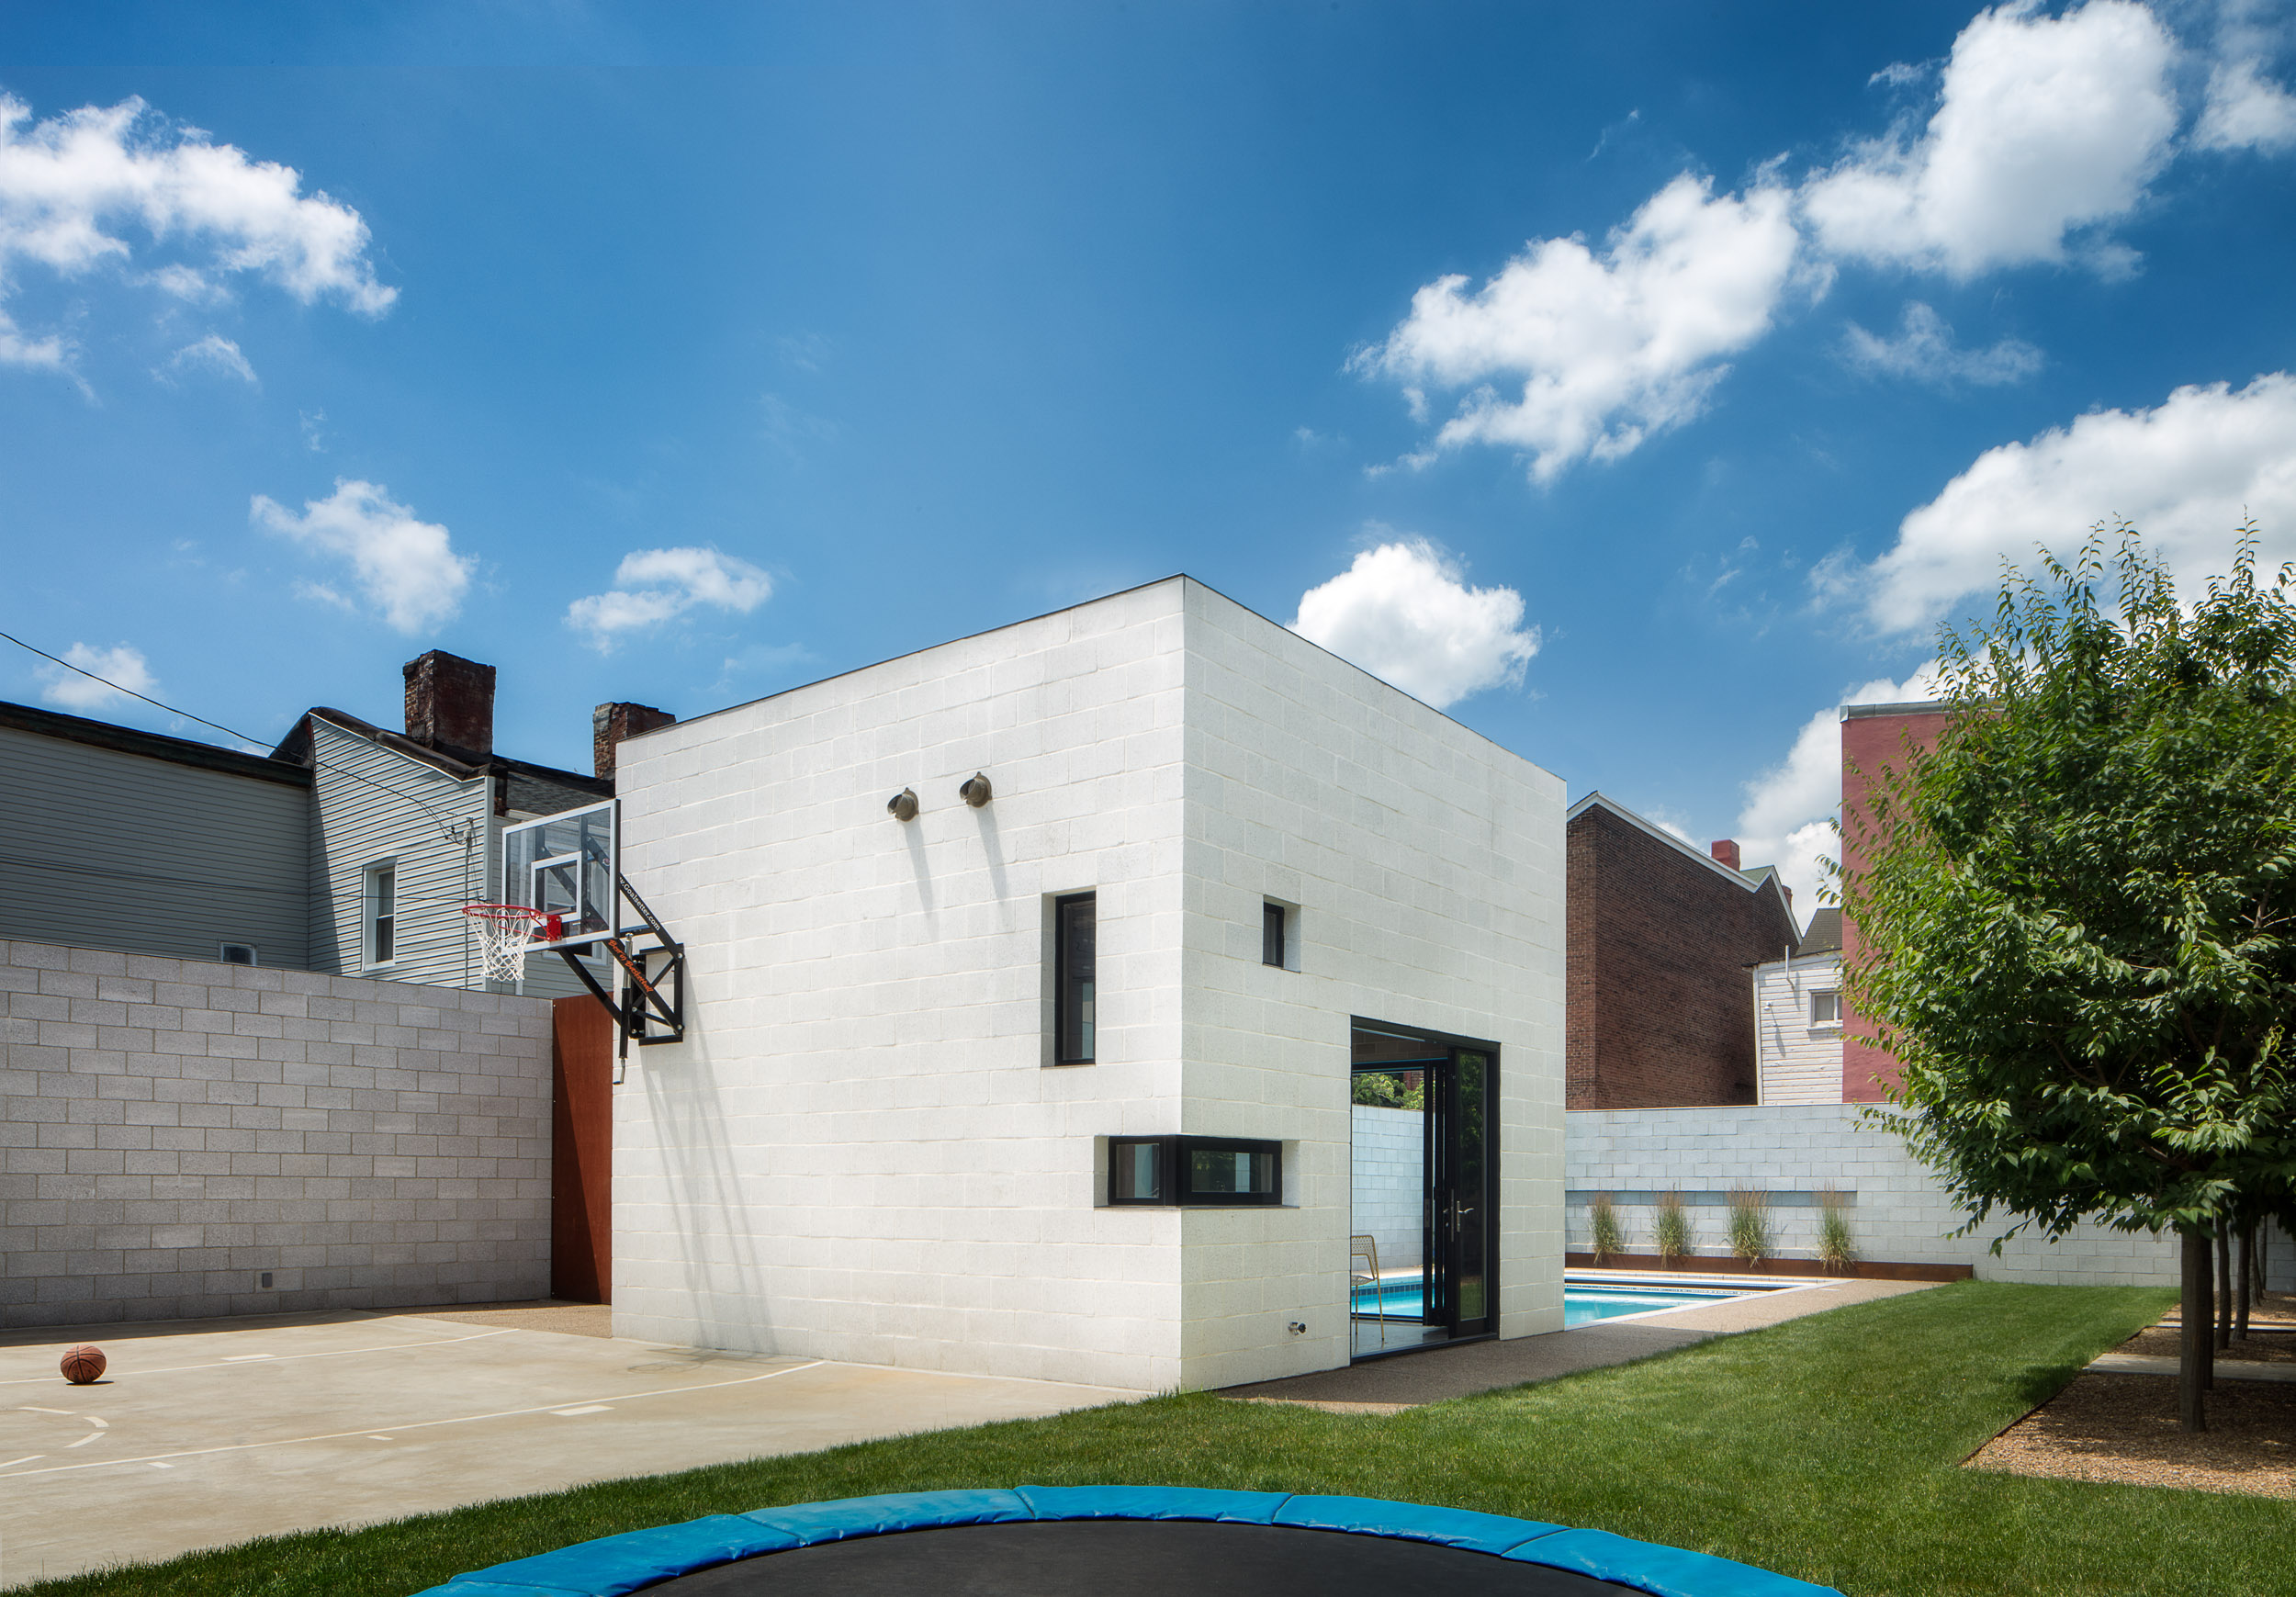 pool_pavilion_pittsburgh_design_poolhouse-4.jpg